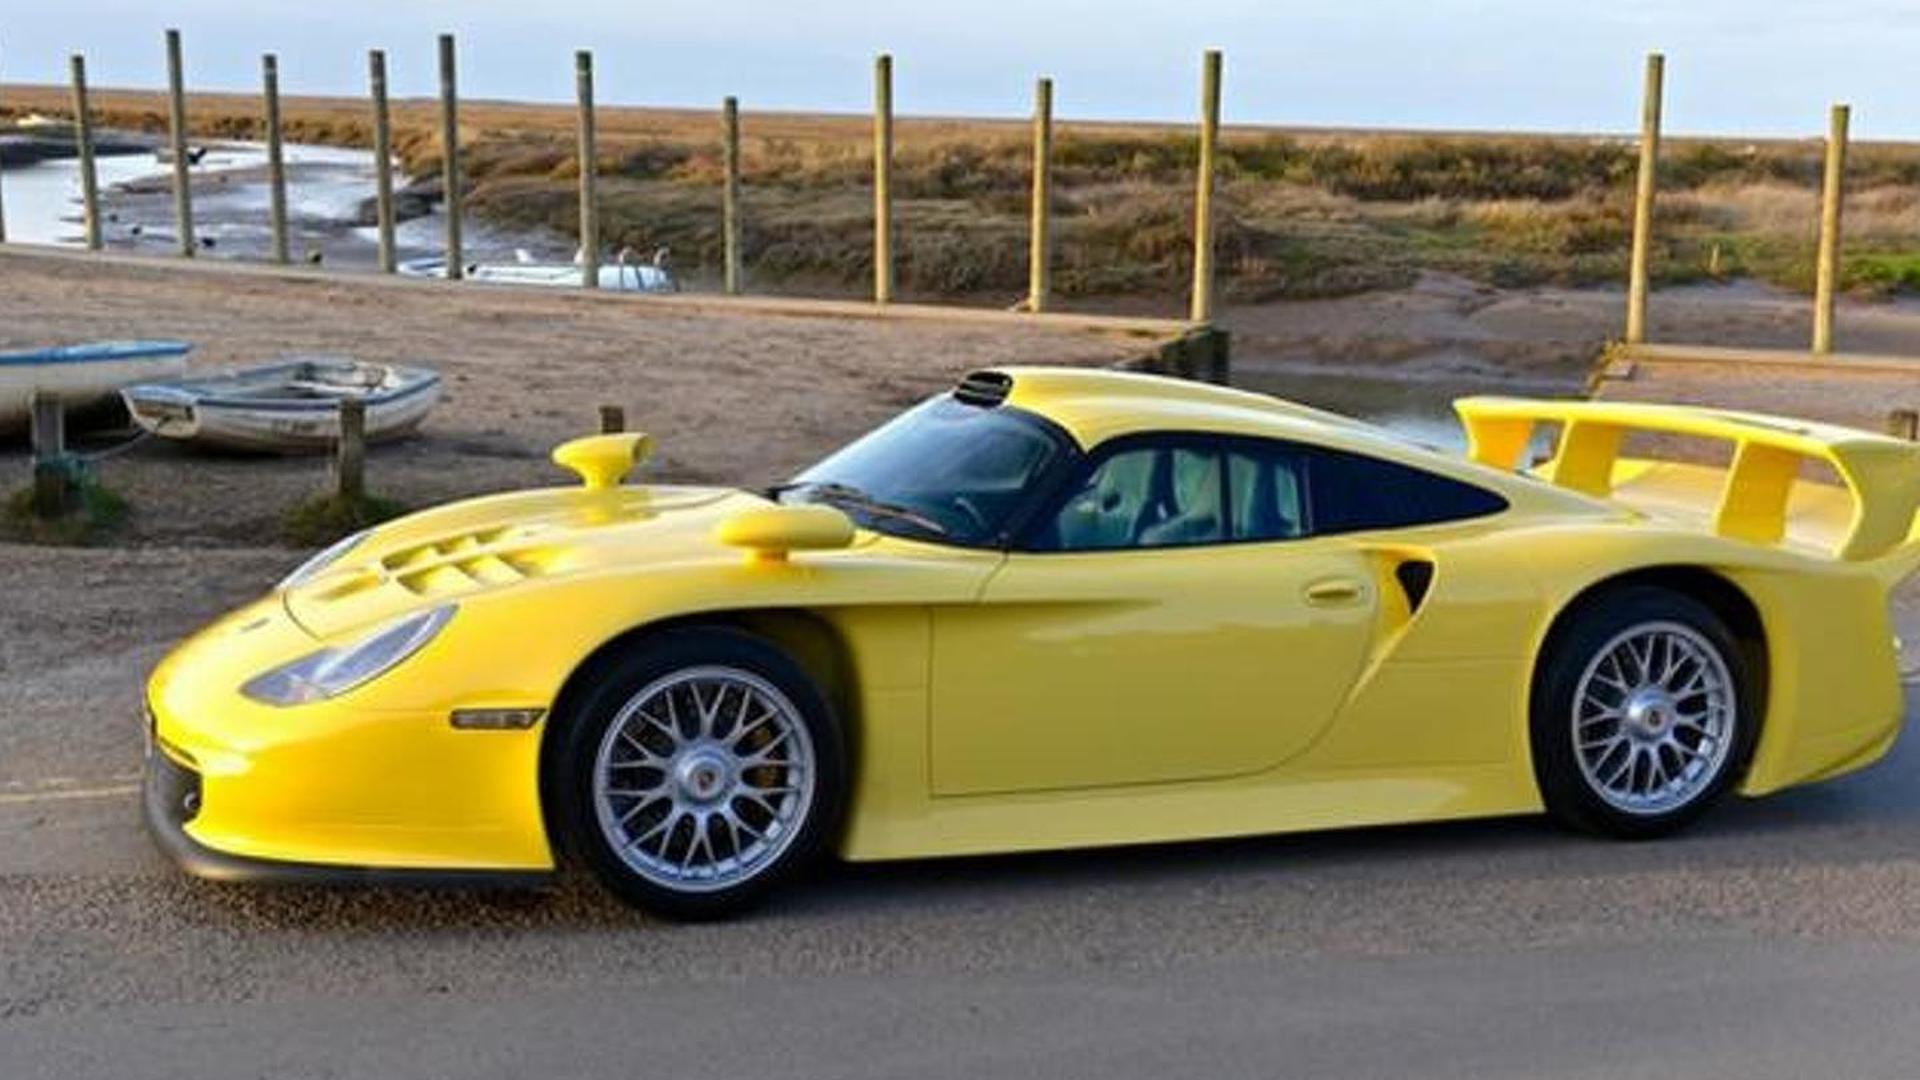 2014-463004-1998-porsche-911-gt1-strassenversion1 Terrific Porsche 911 Gt1 98 Road Car Cars Trend